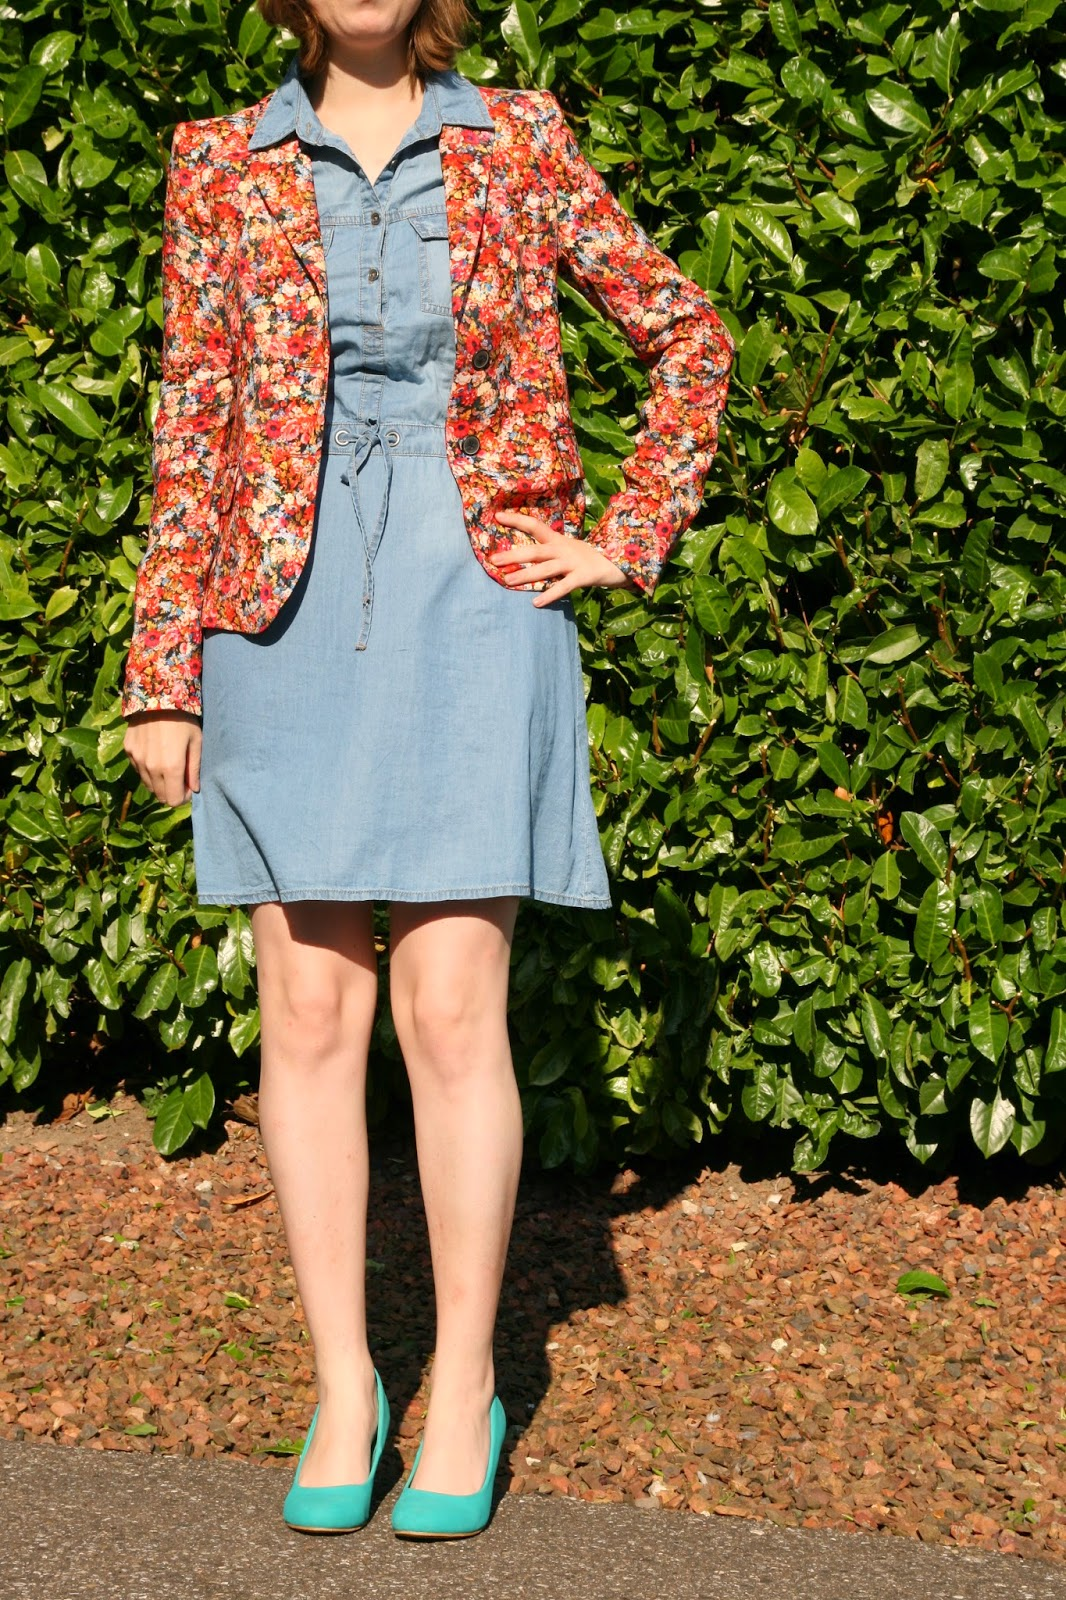 http://hmlovur.blogspot.nl/2014/09/outfits-of-week-week-37.html